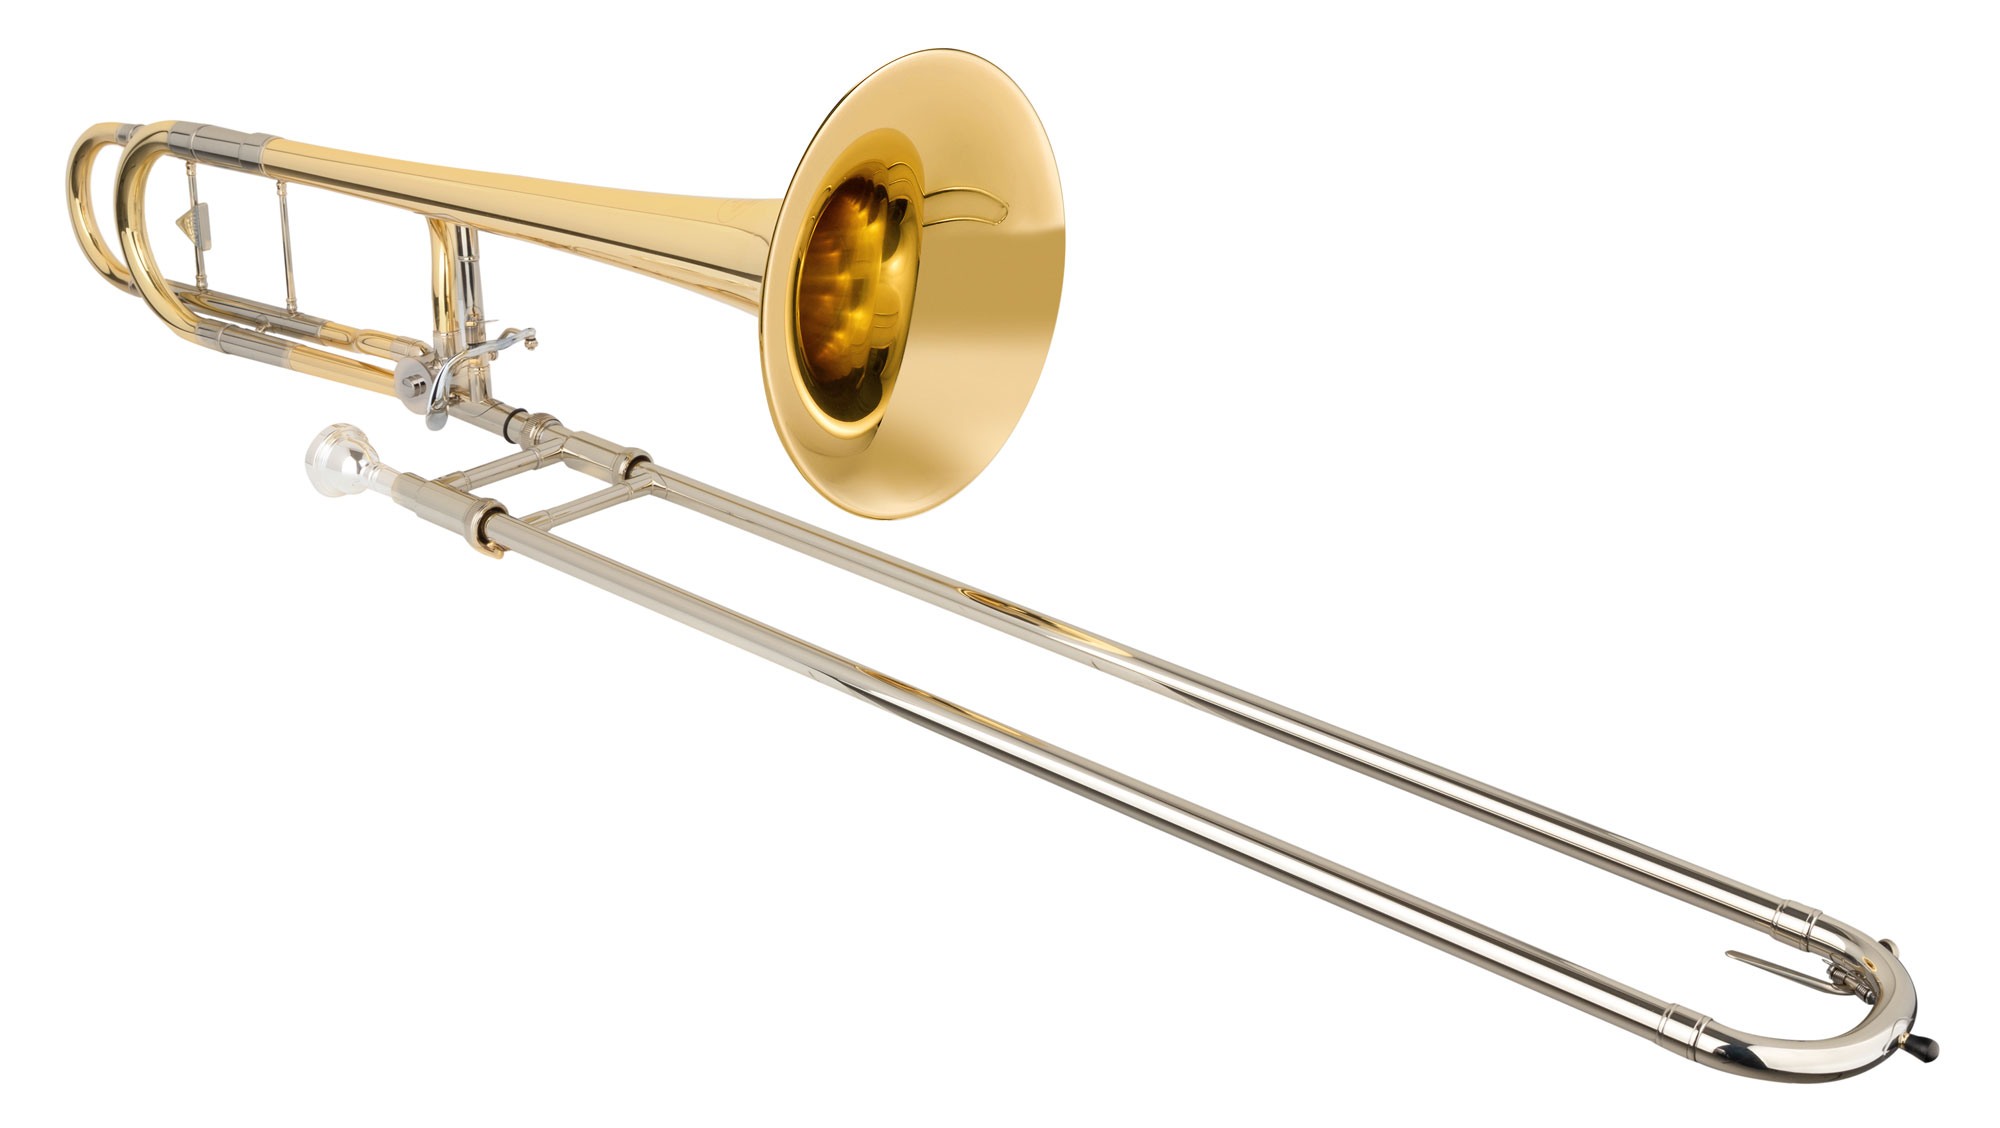 Posaunen - Kühnl Hoyer .547 B|F Tenorposaune Goldmessing - Onlineshop Musikhaus Kirstein